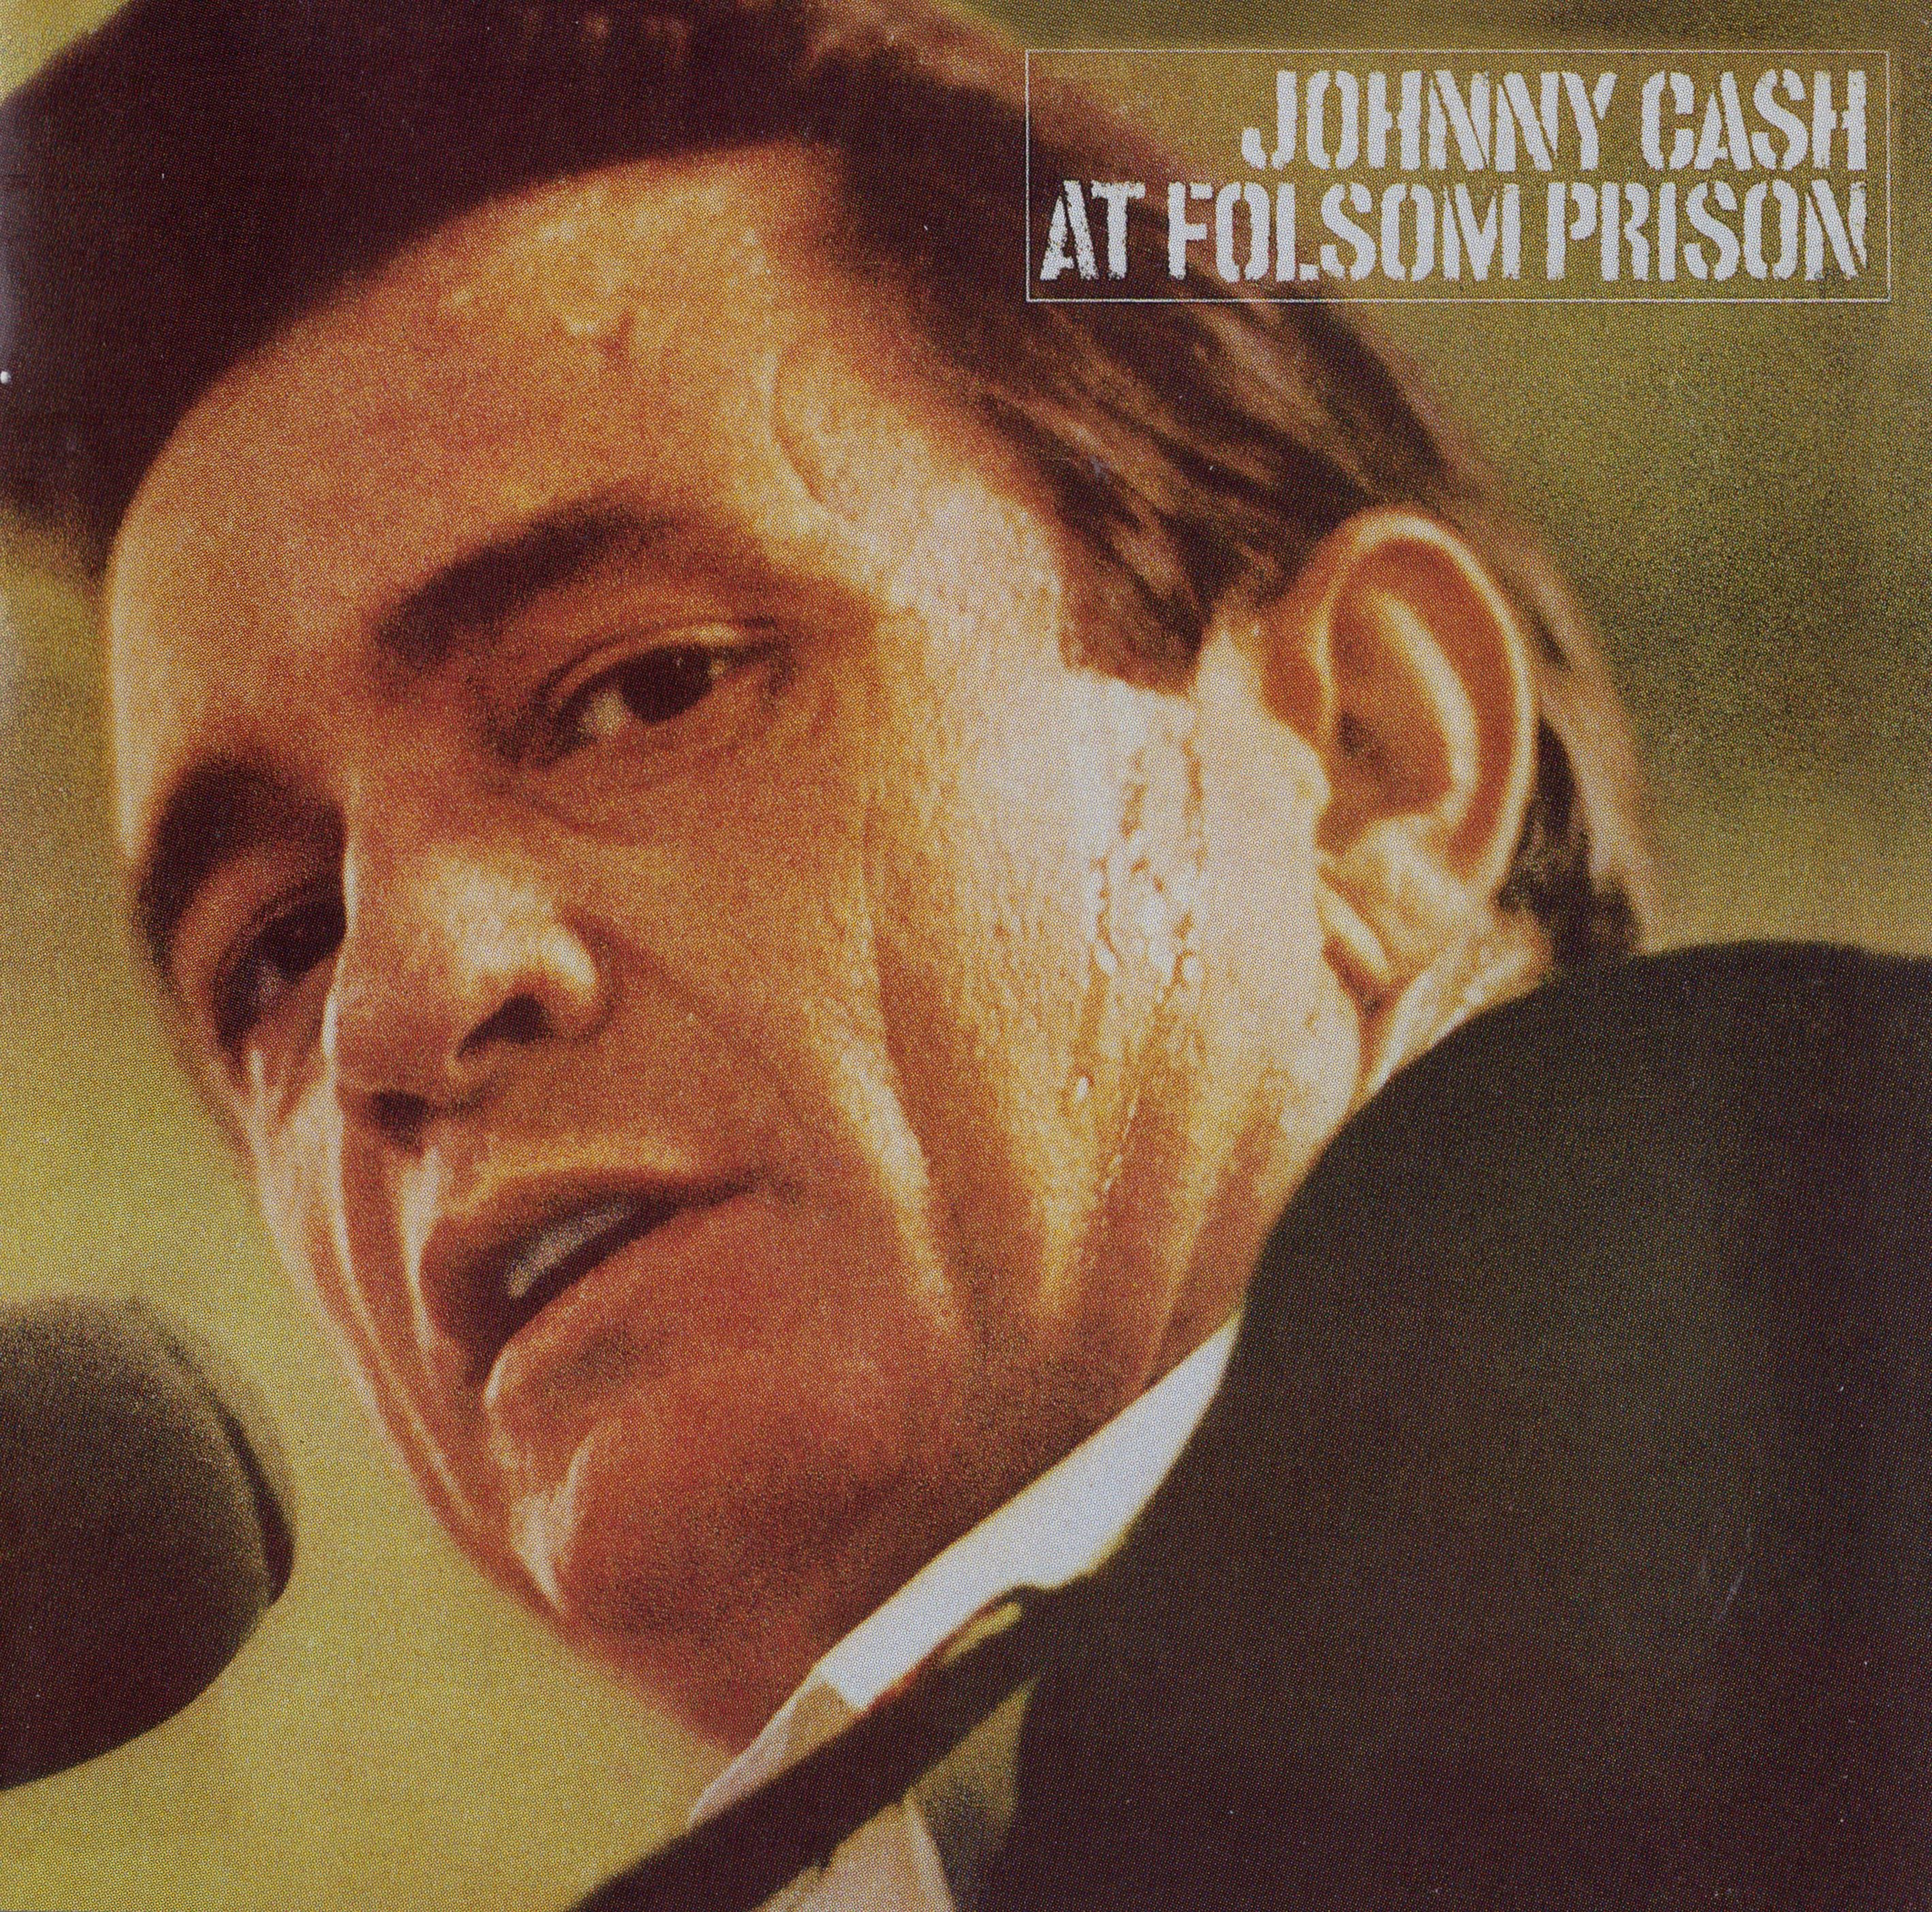 Johnny Cash - Johnny Cash At Folsom Prison - Album Cover